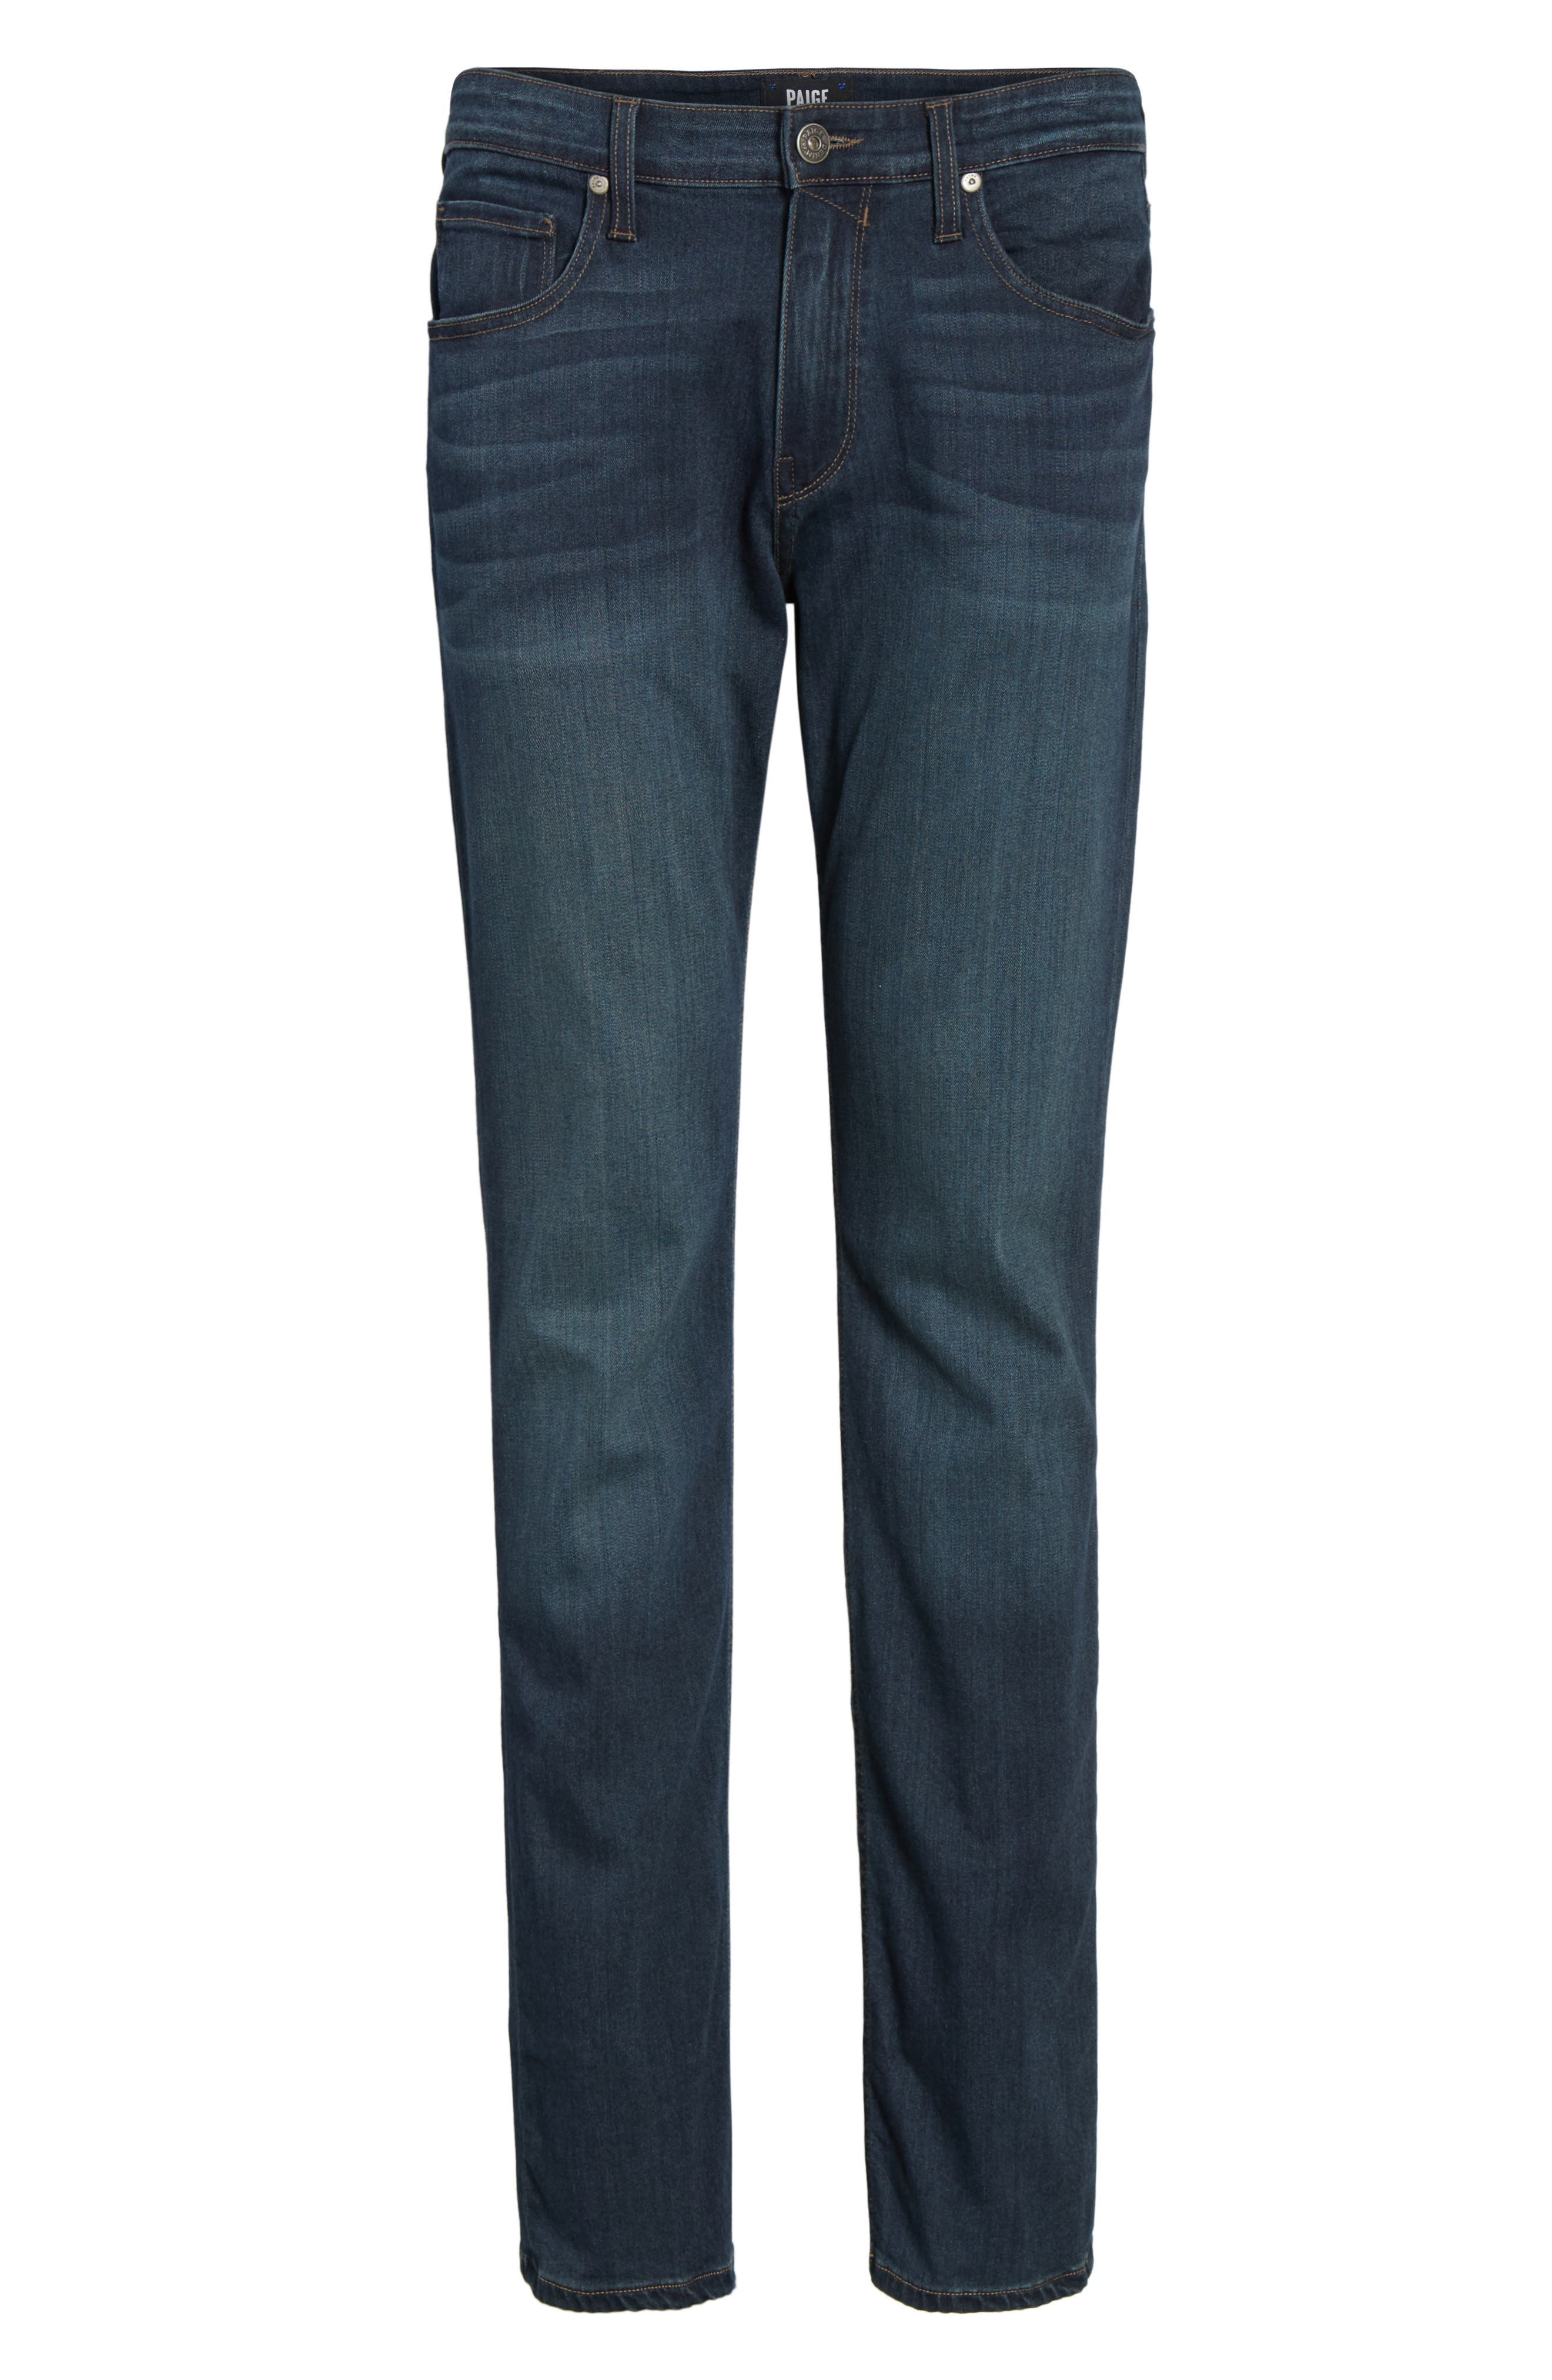 Normandie Straight Fit Jeans,                             Alternate thumbnail 6, color,                             400